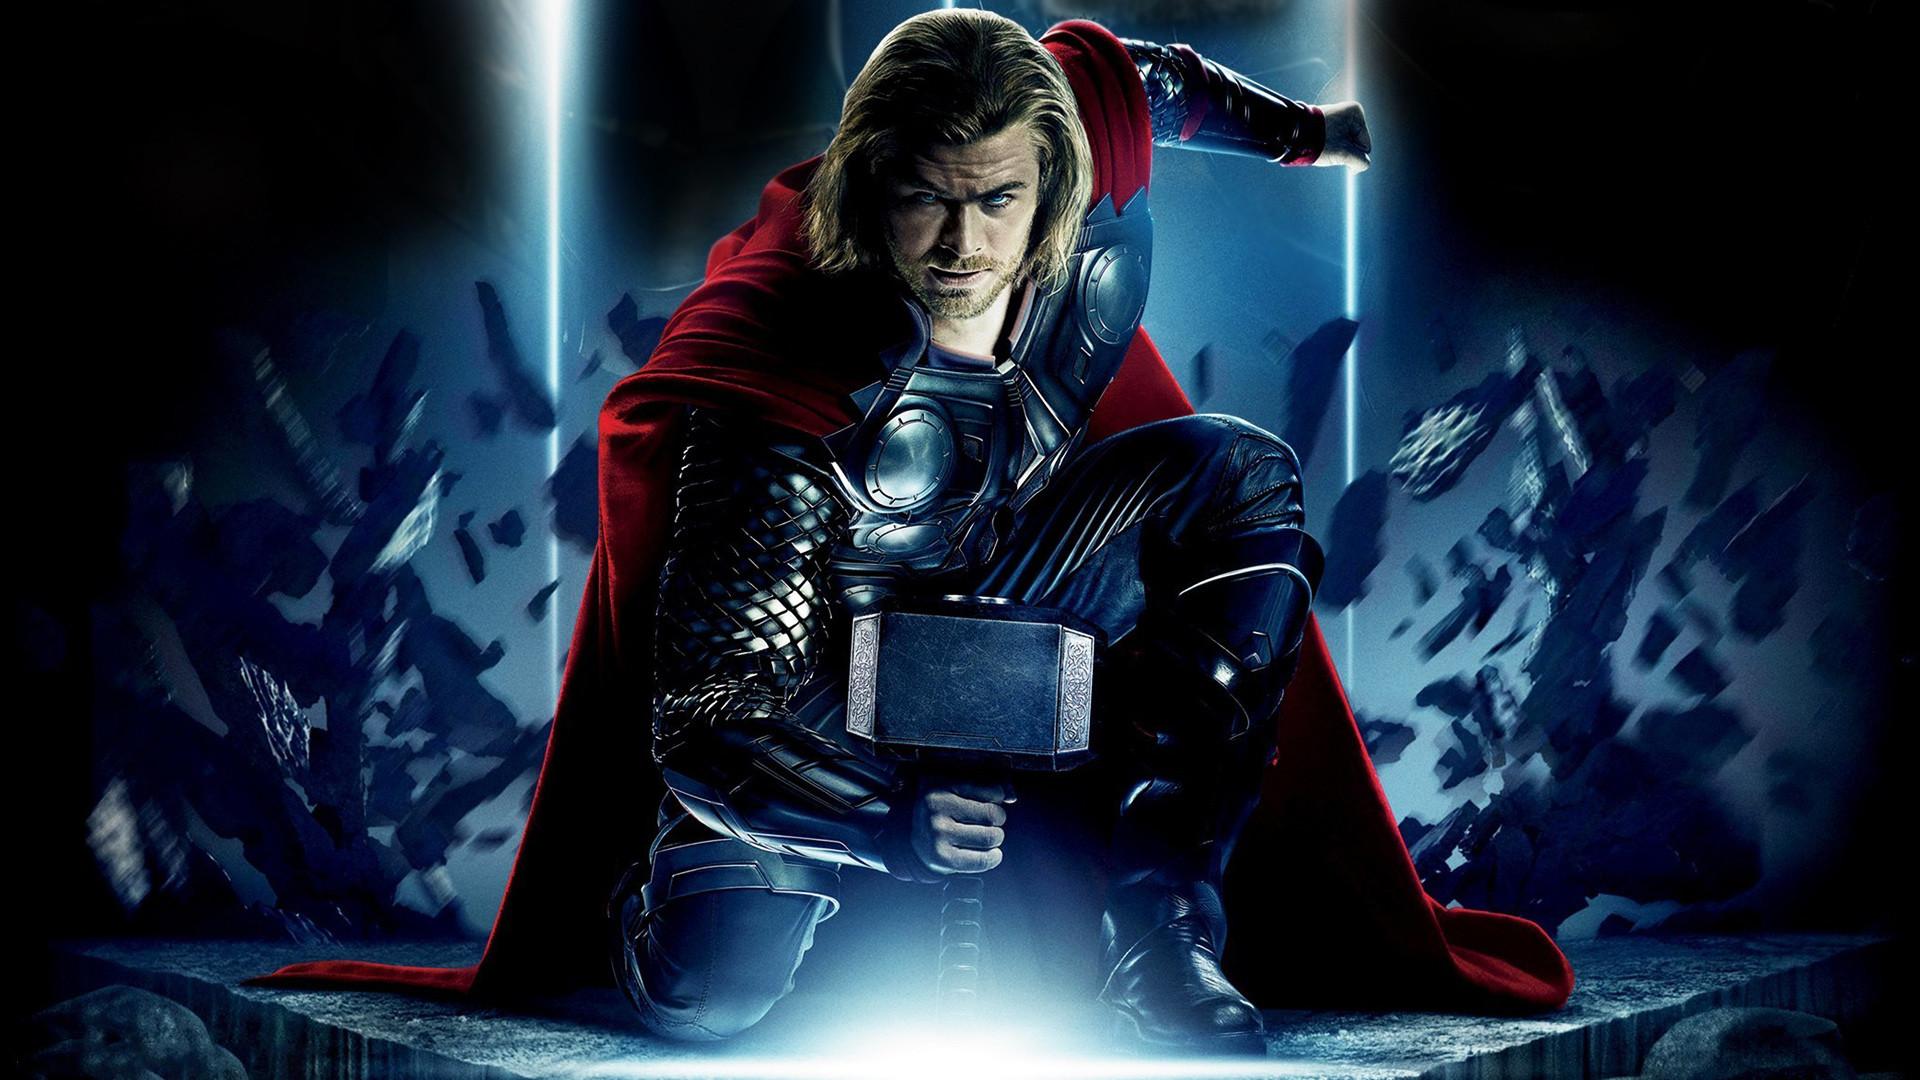 Res: 1920x1080, Thor Avengers Movie Wallpaper Wallpaper